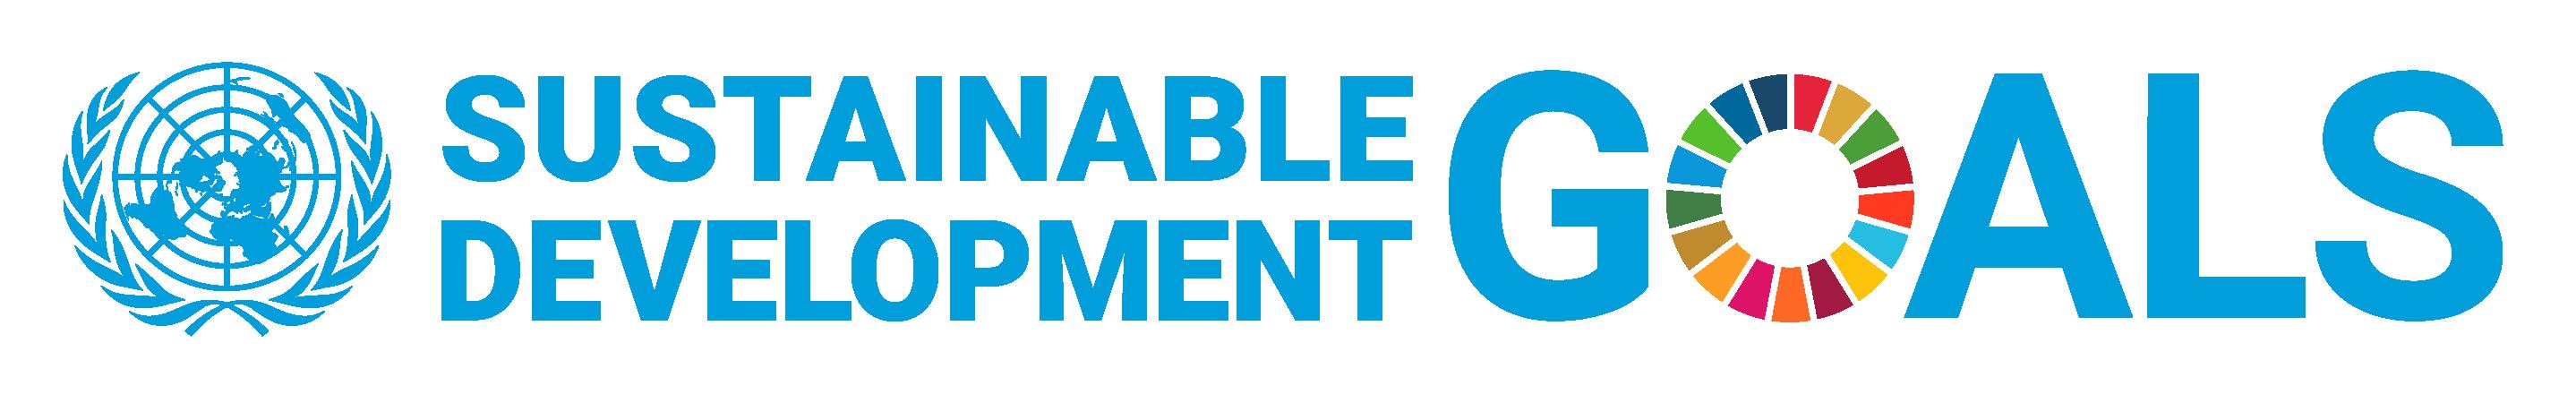 SDG Logo Image